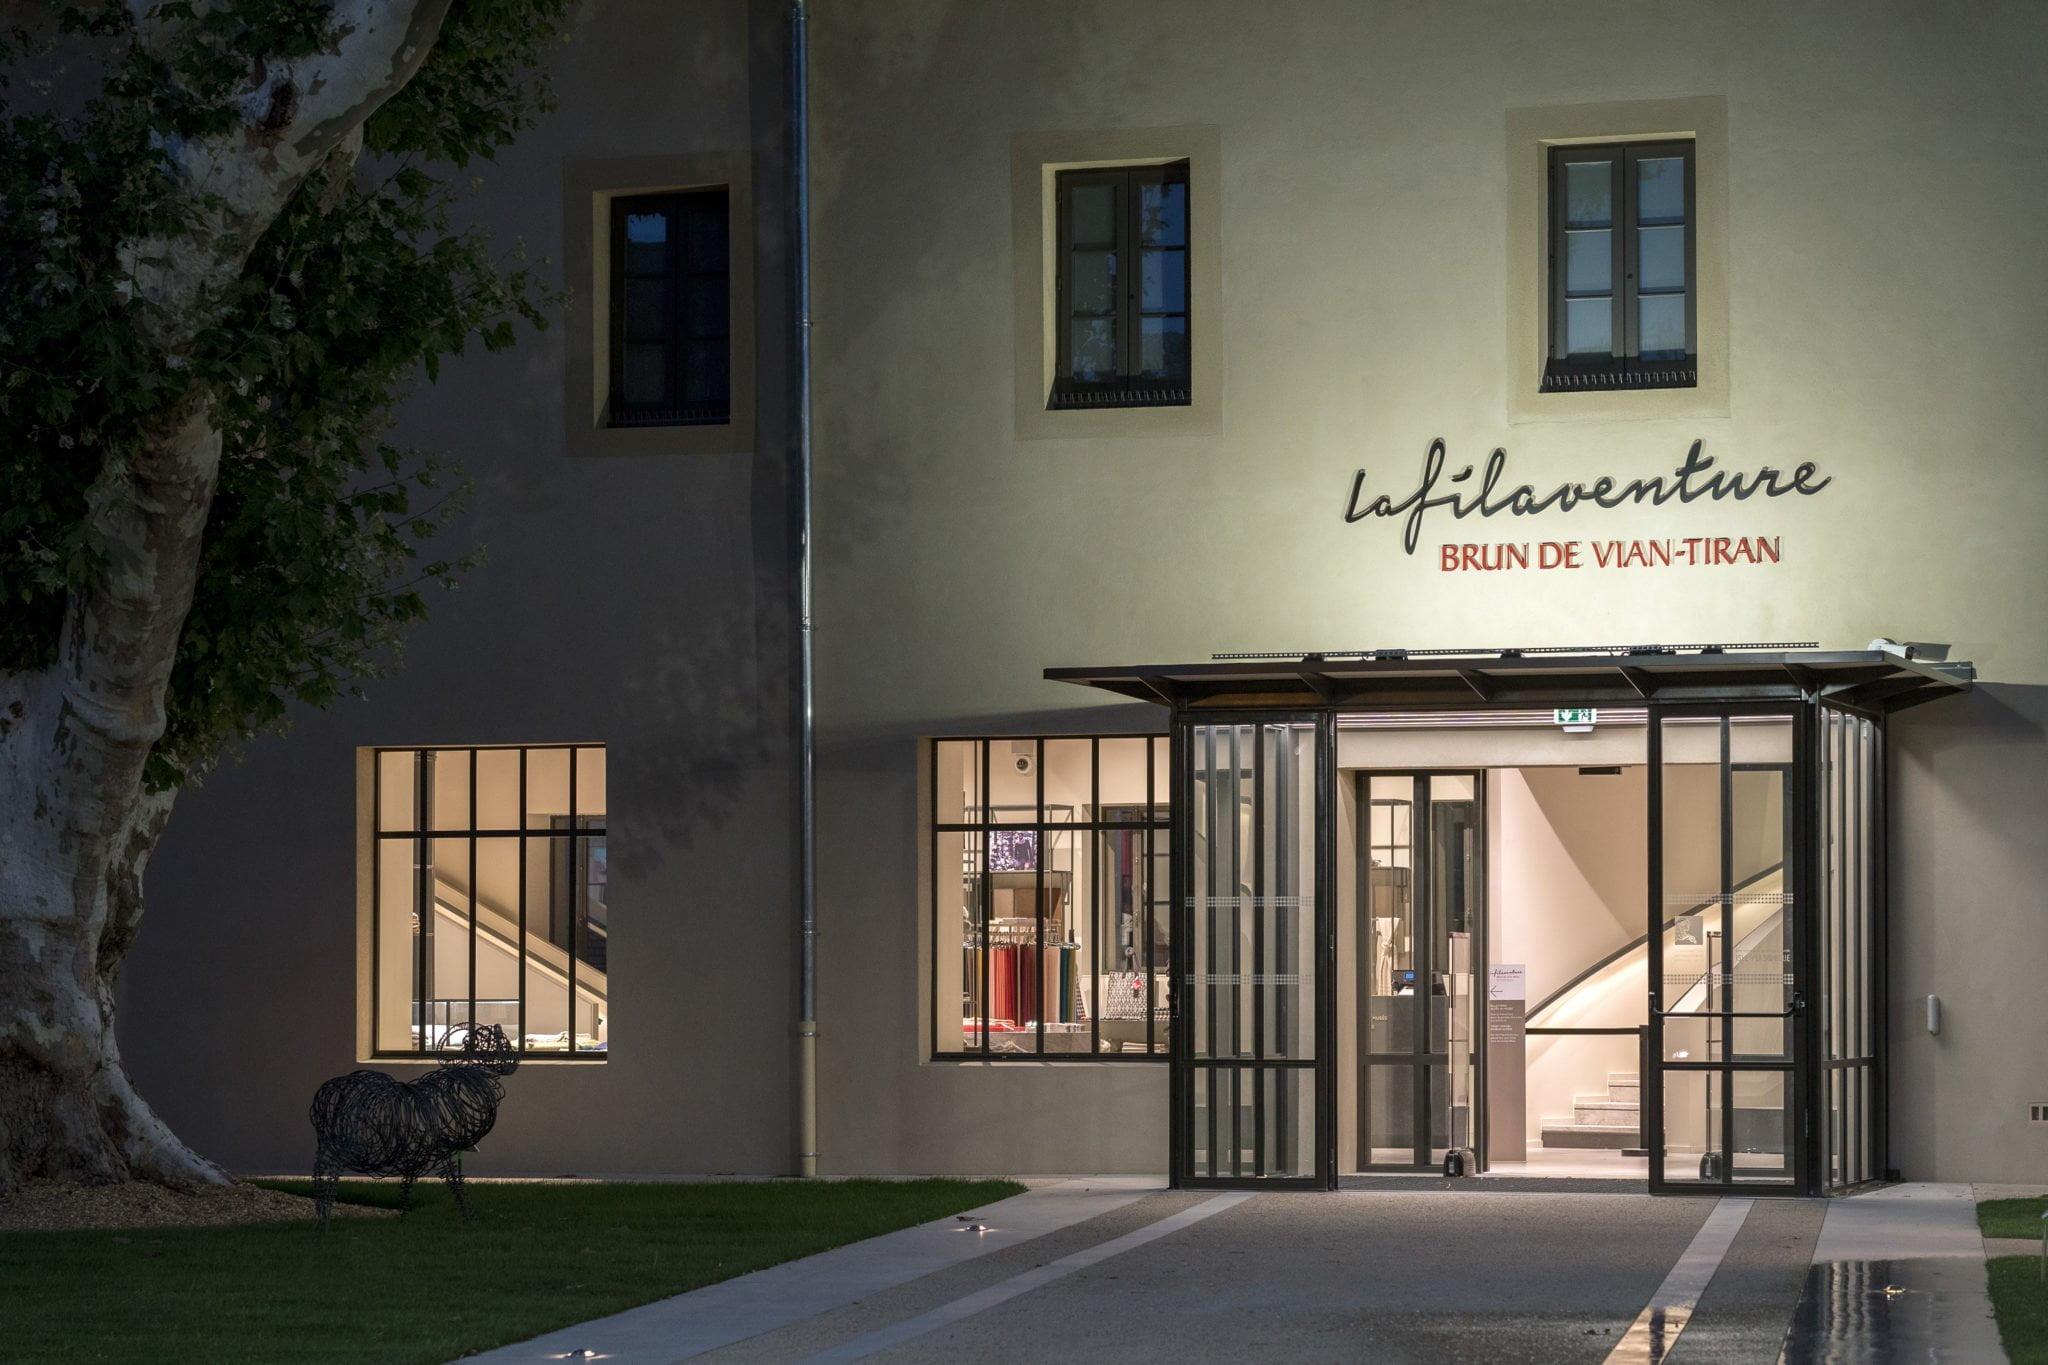 La Filaventure musée sensoriel